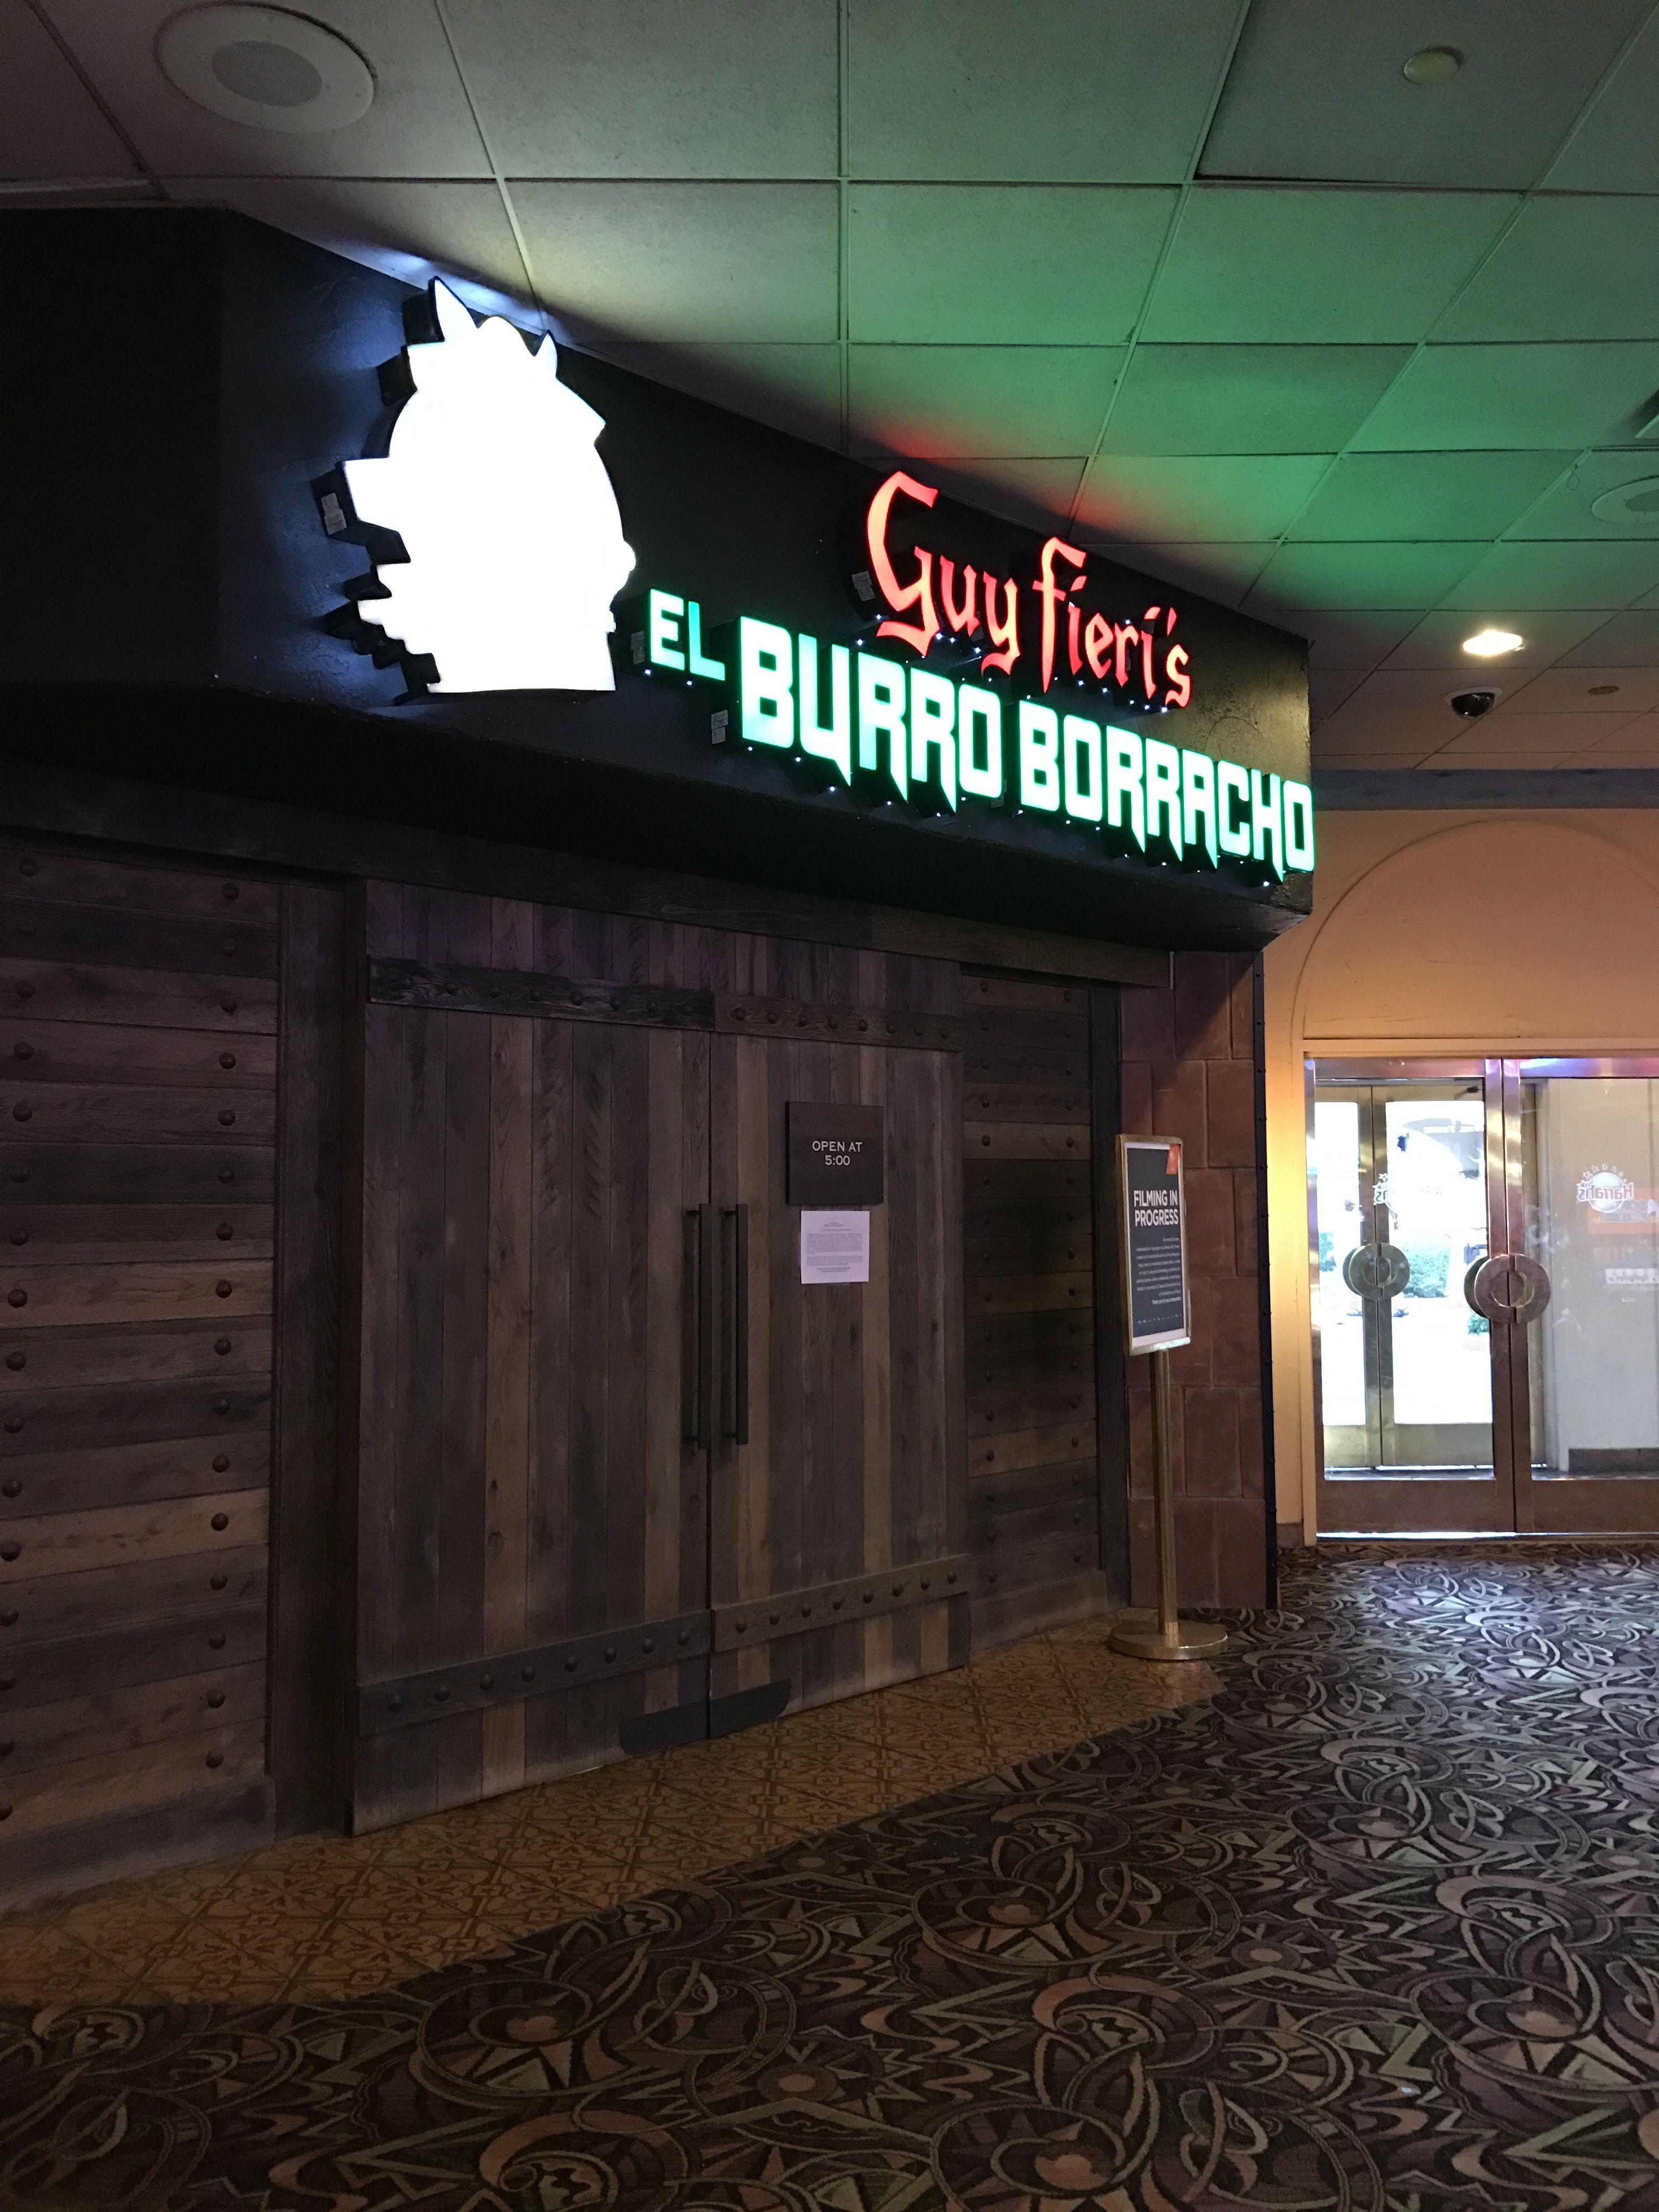 guy fieri s el burro borracho restaurant laughlin nv